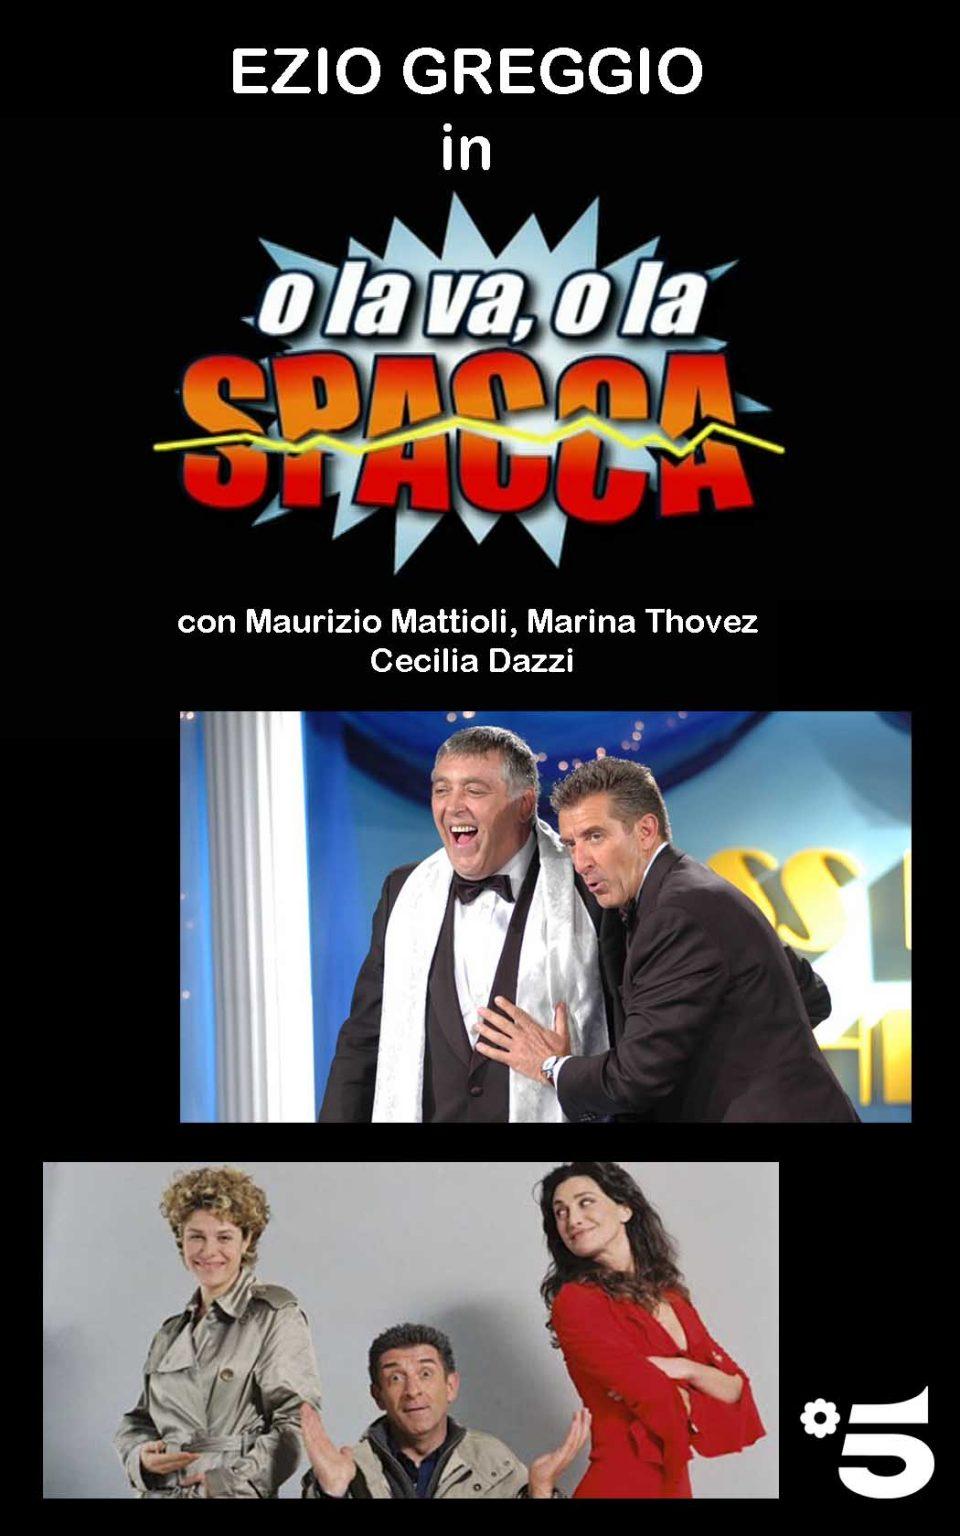 O la va o la spacca (2004)